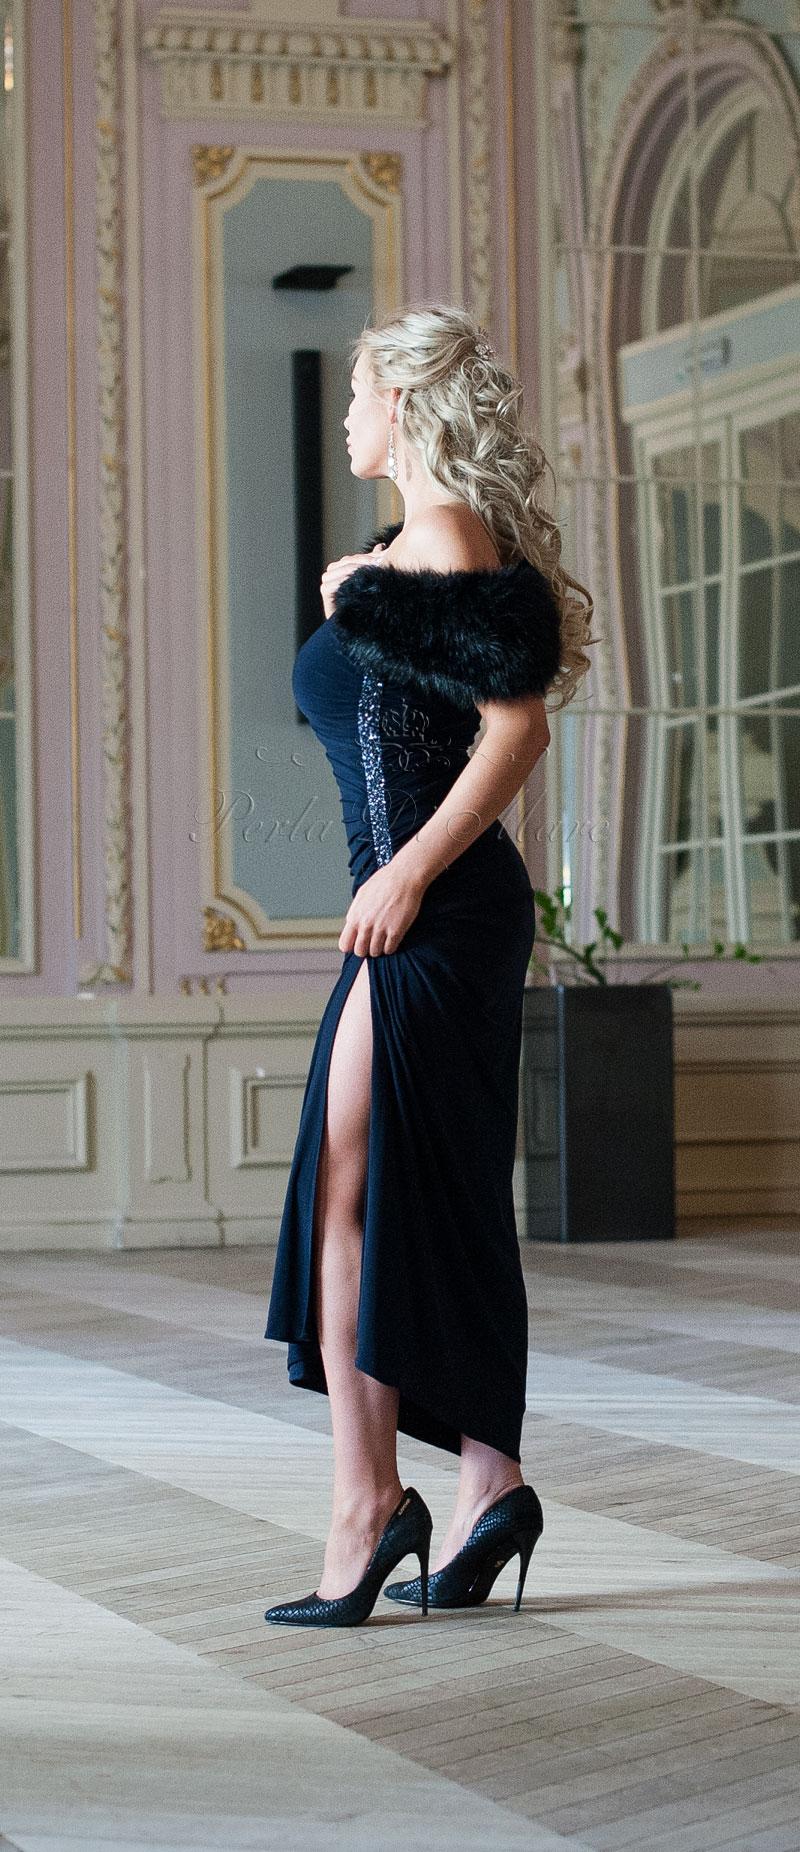 perla di mare exclusive escort models